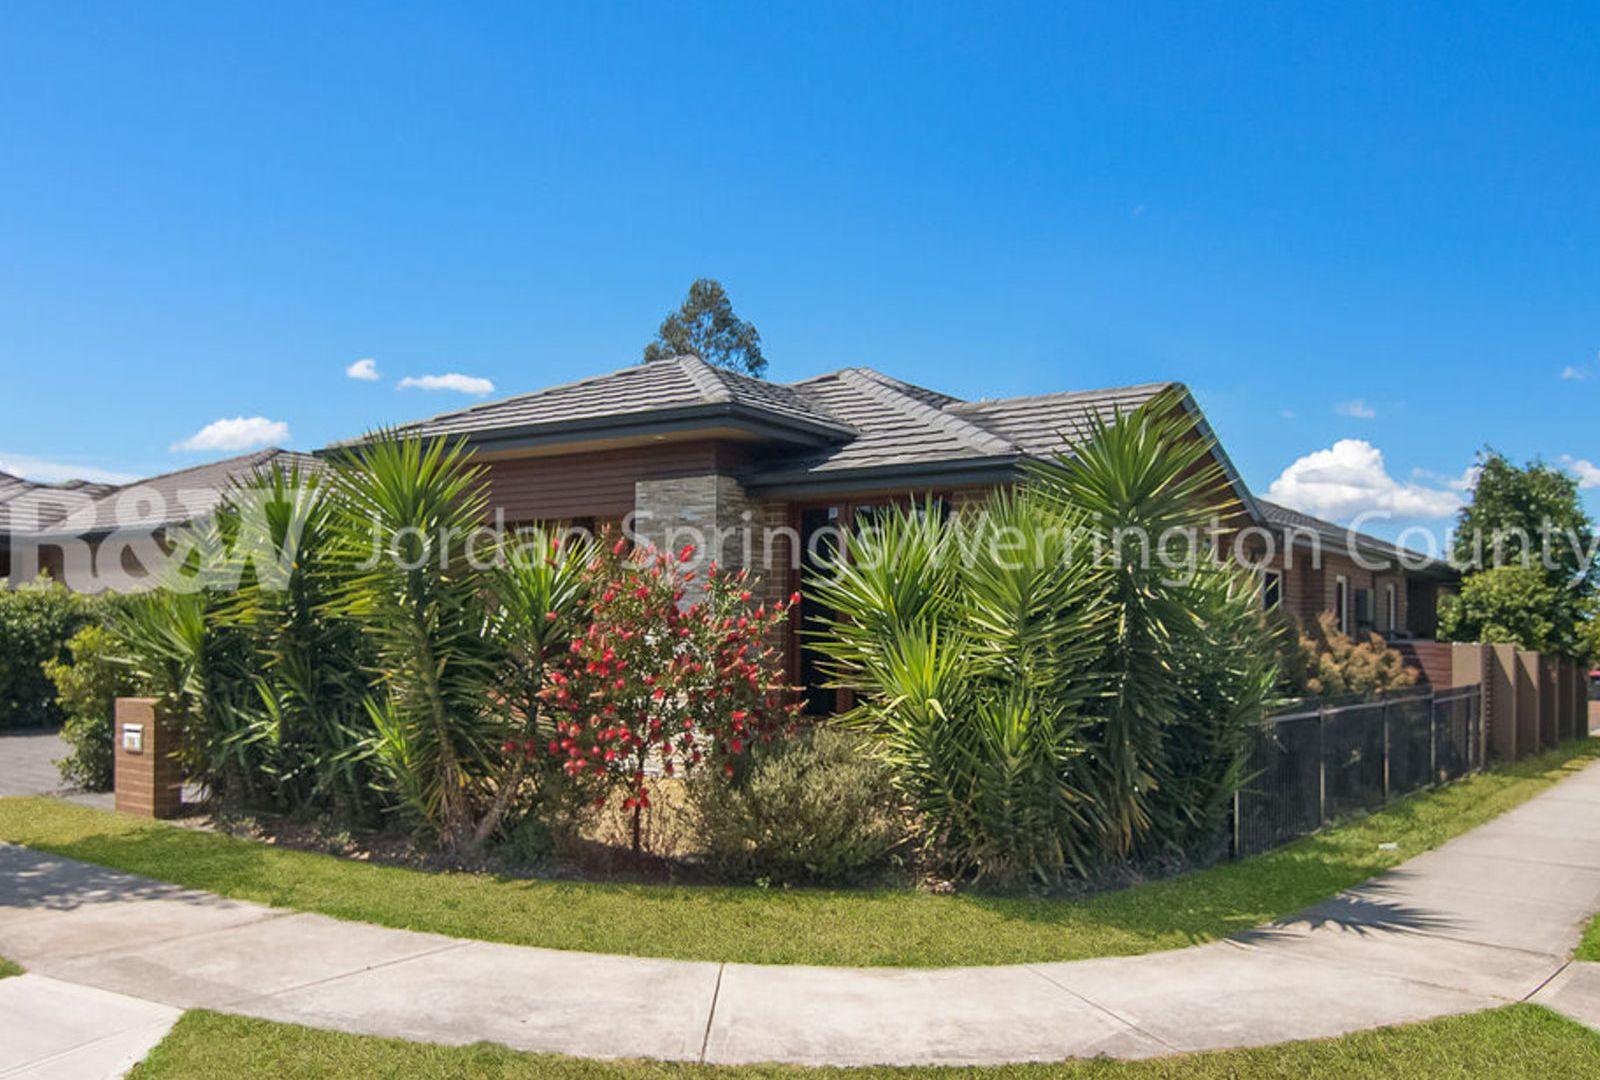 14 McGarritys Place, Jordan Springs NSW 2747, Image 1